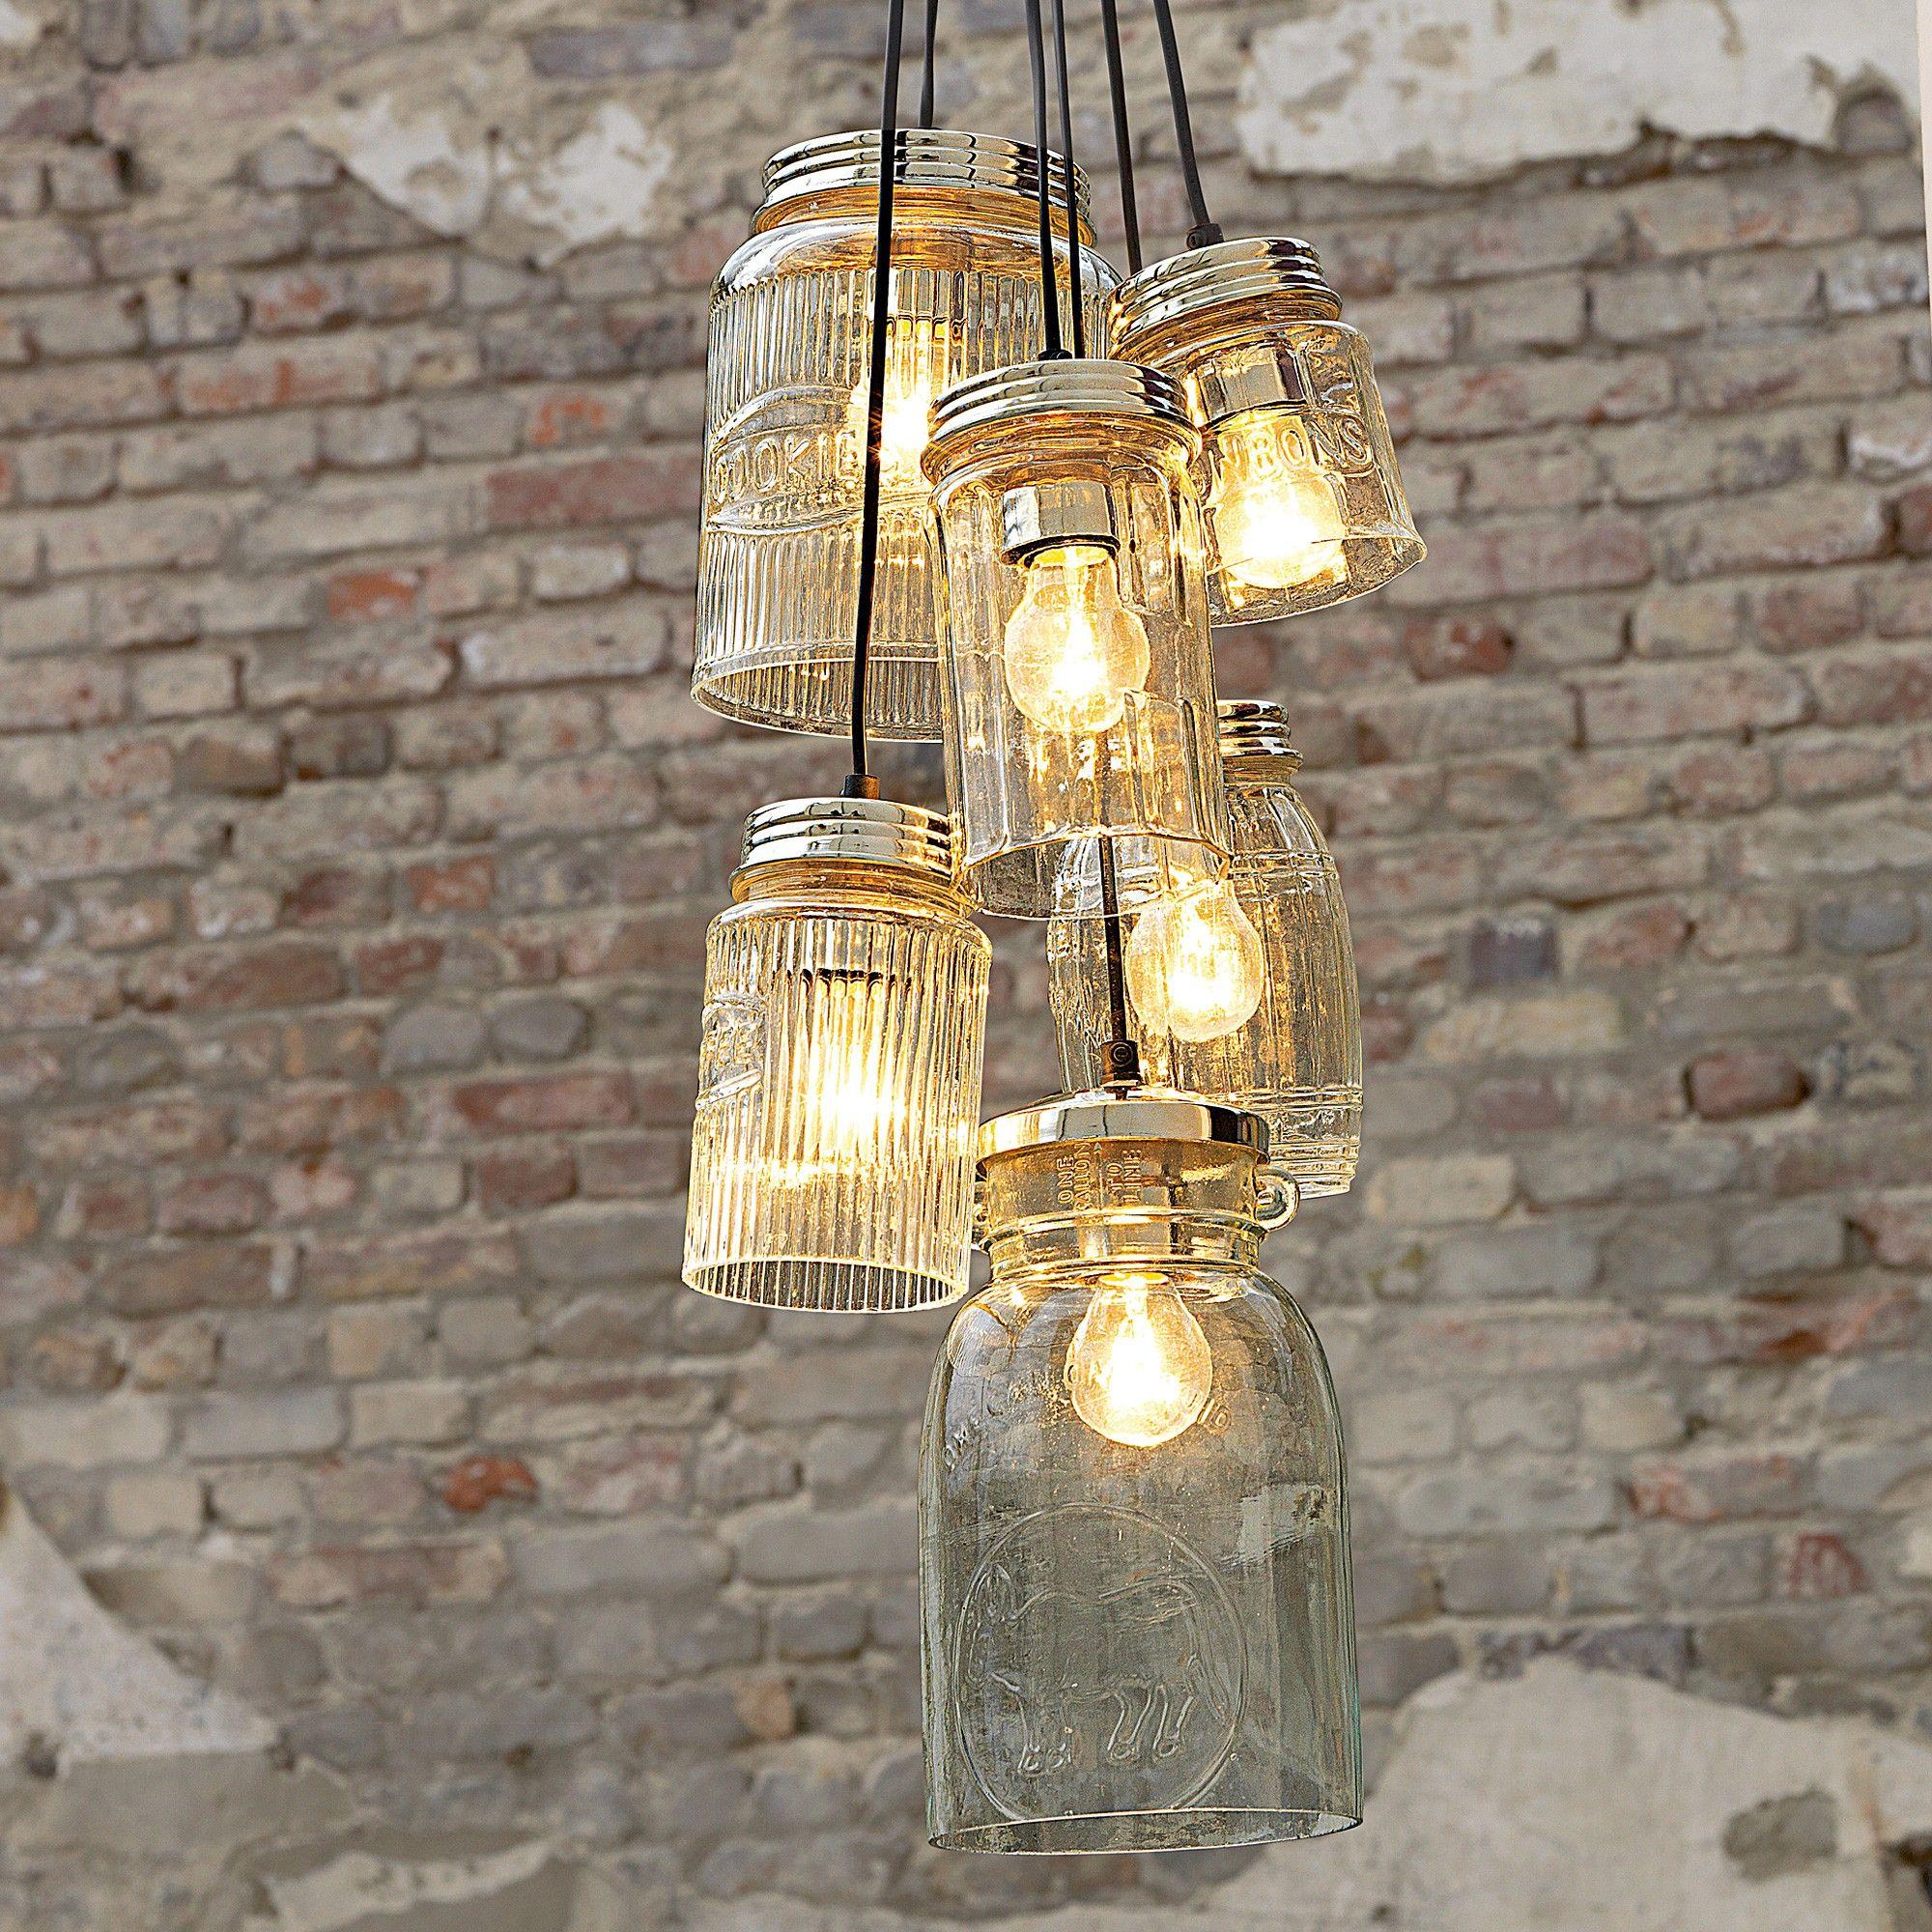 Vintage Lampe, Deckenleuchte Design, Rustikale Lampen, Vintage ...